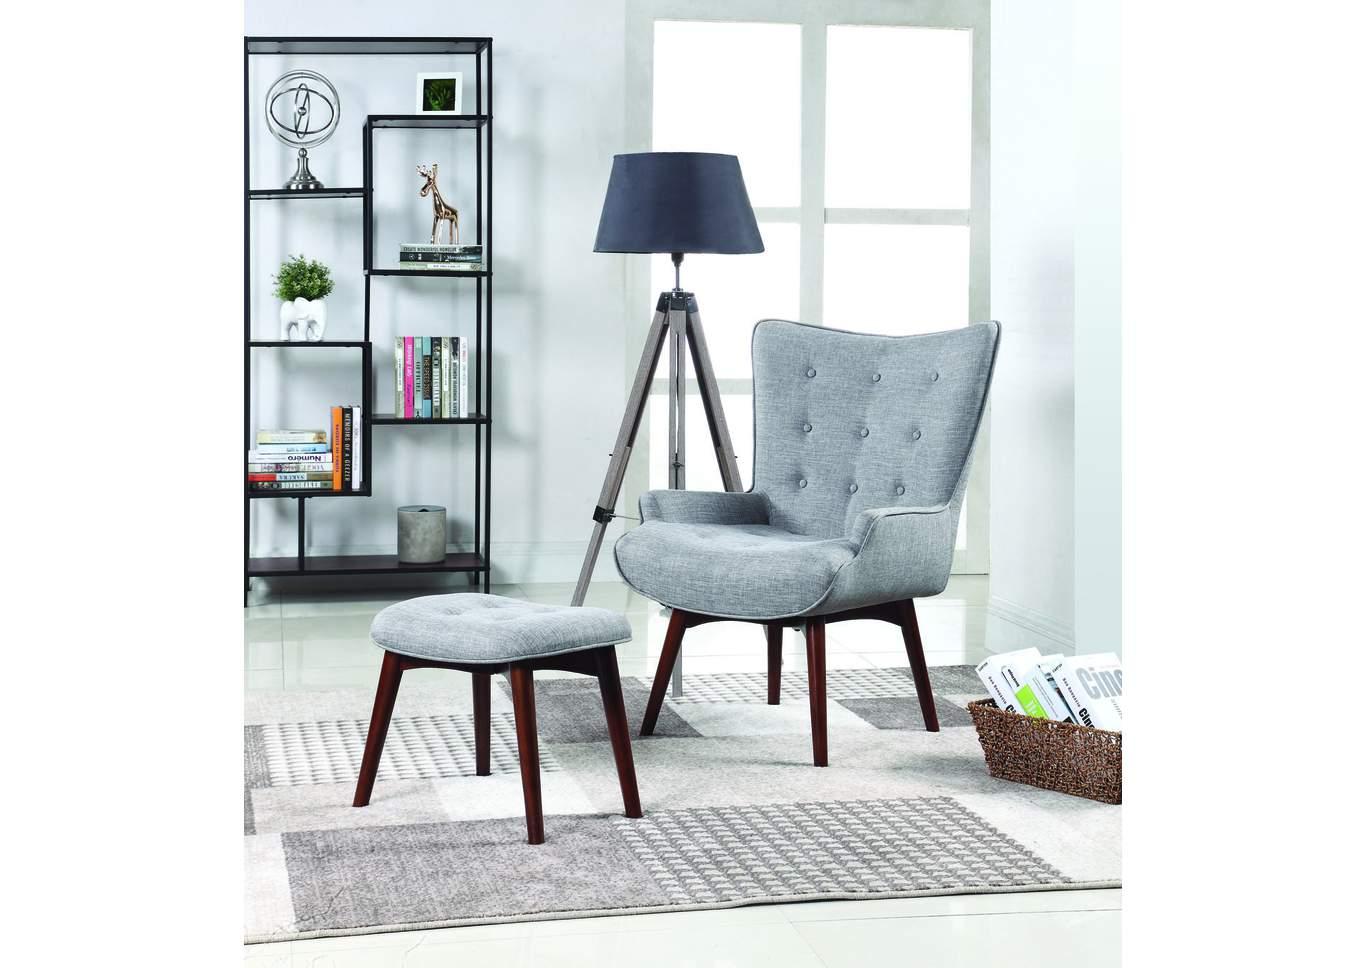 Austins Couch Potatoes Furniture Stores Austin Texas Blue Accent